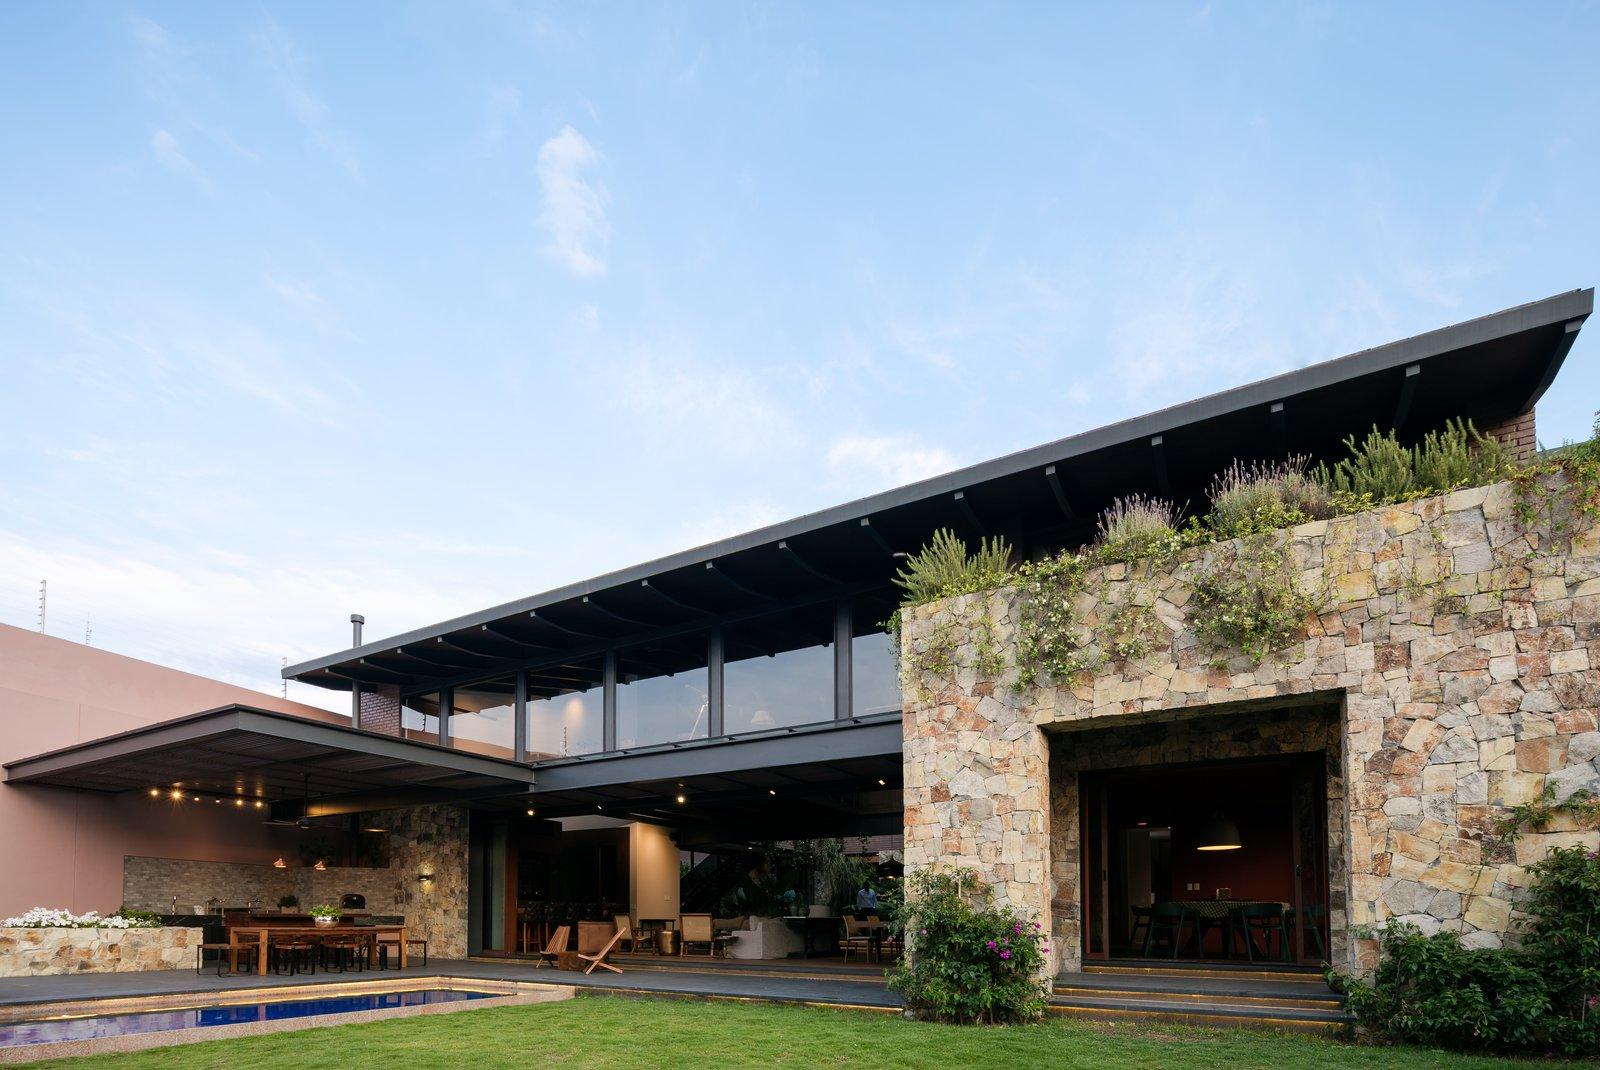 Casa OM1 by AE Arquitectos